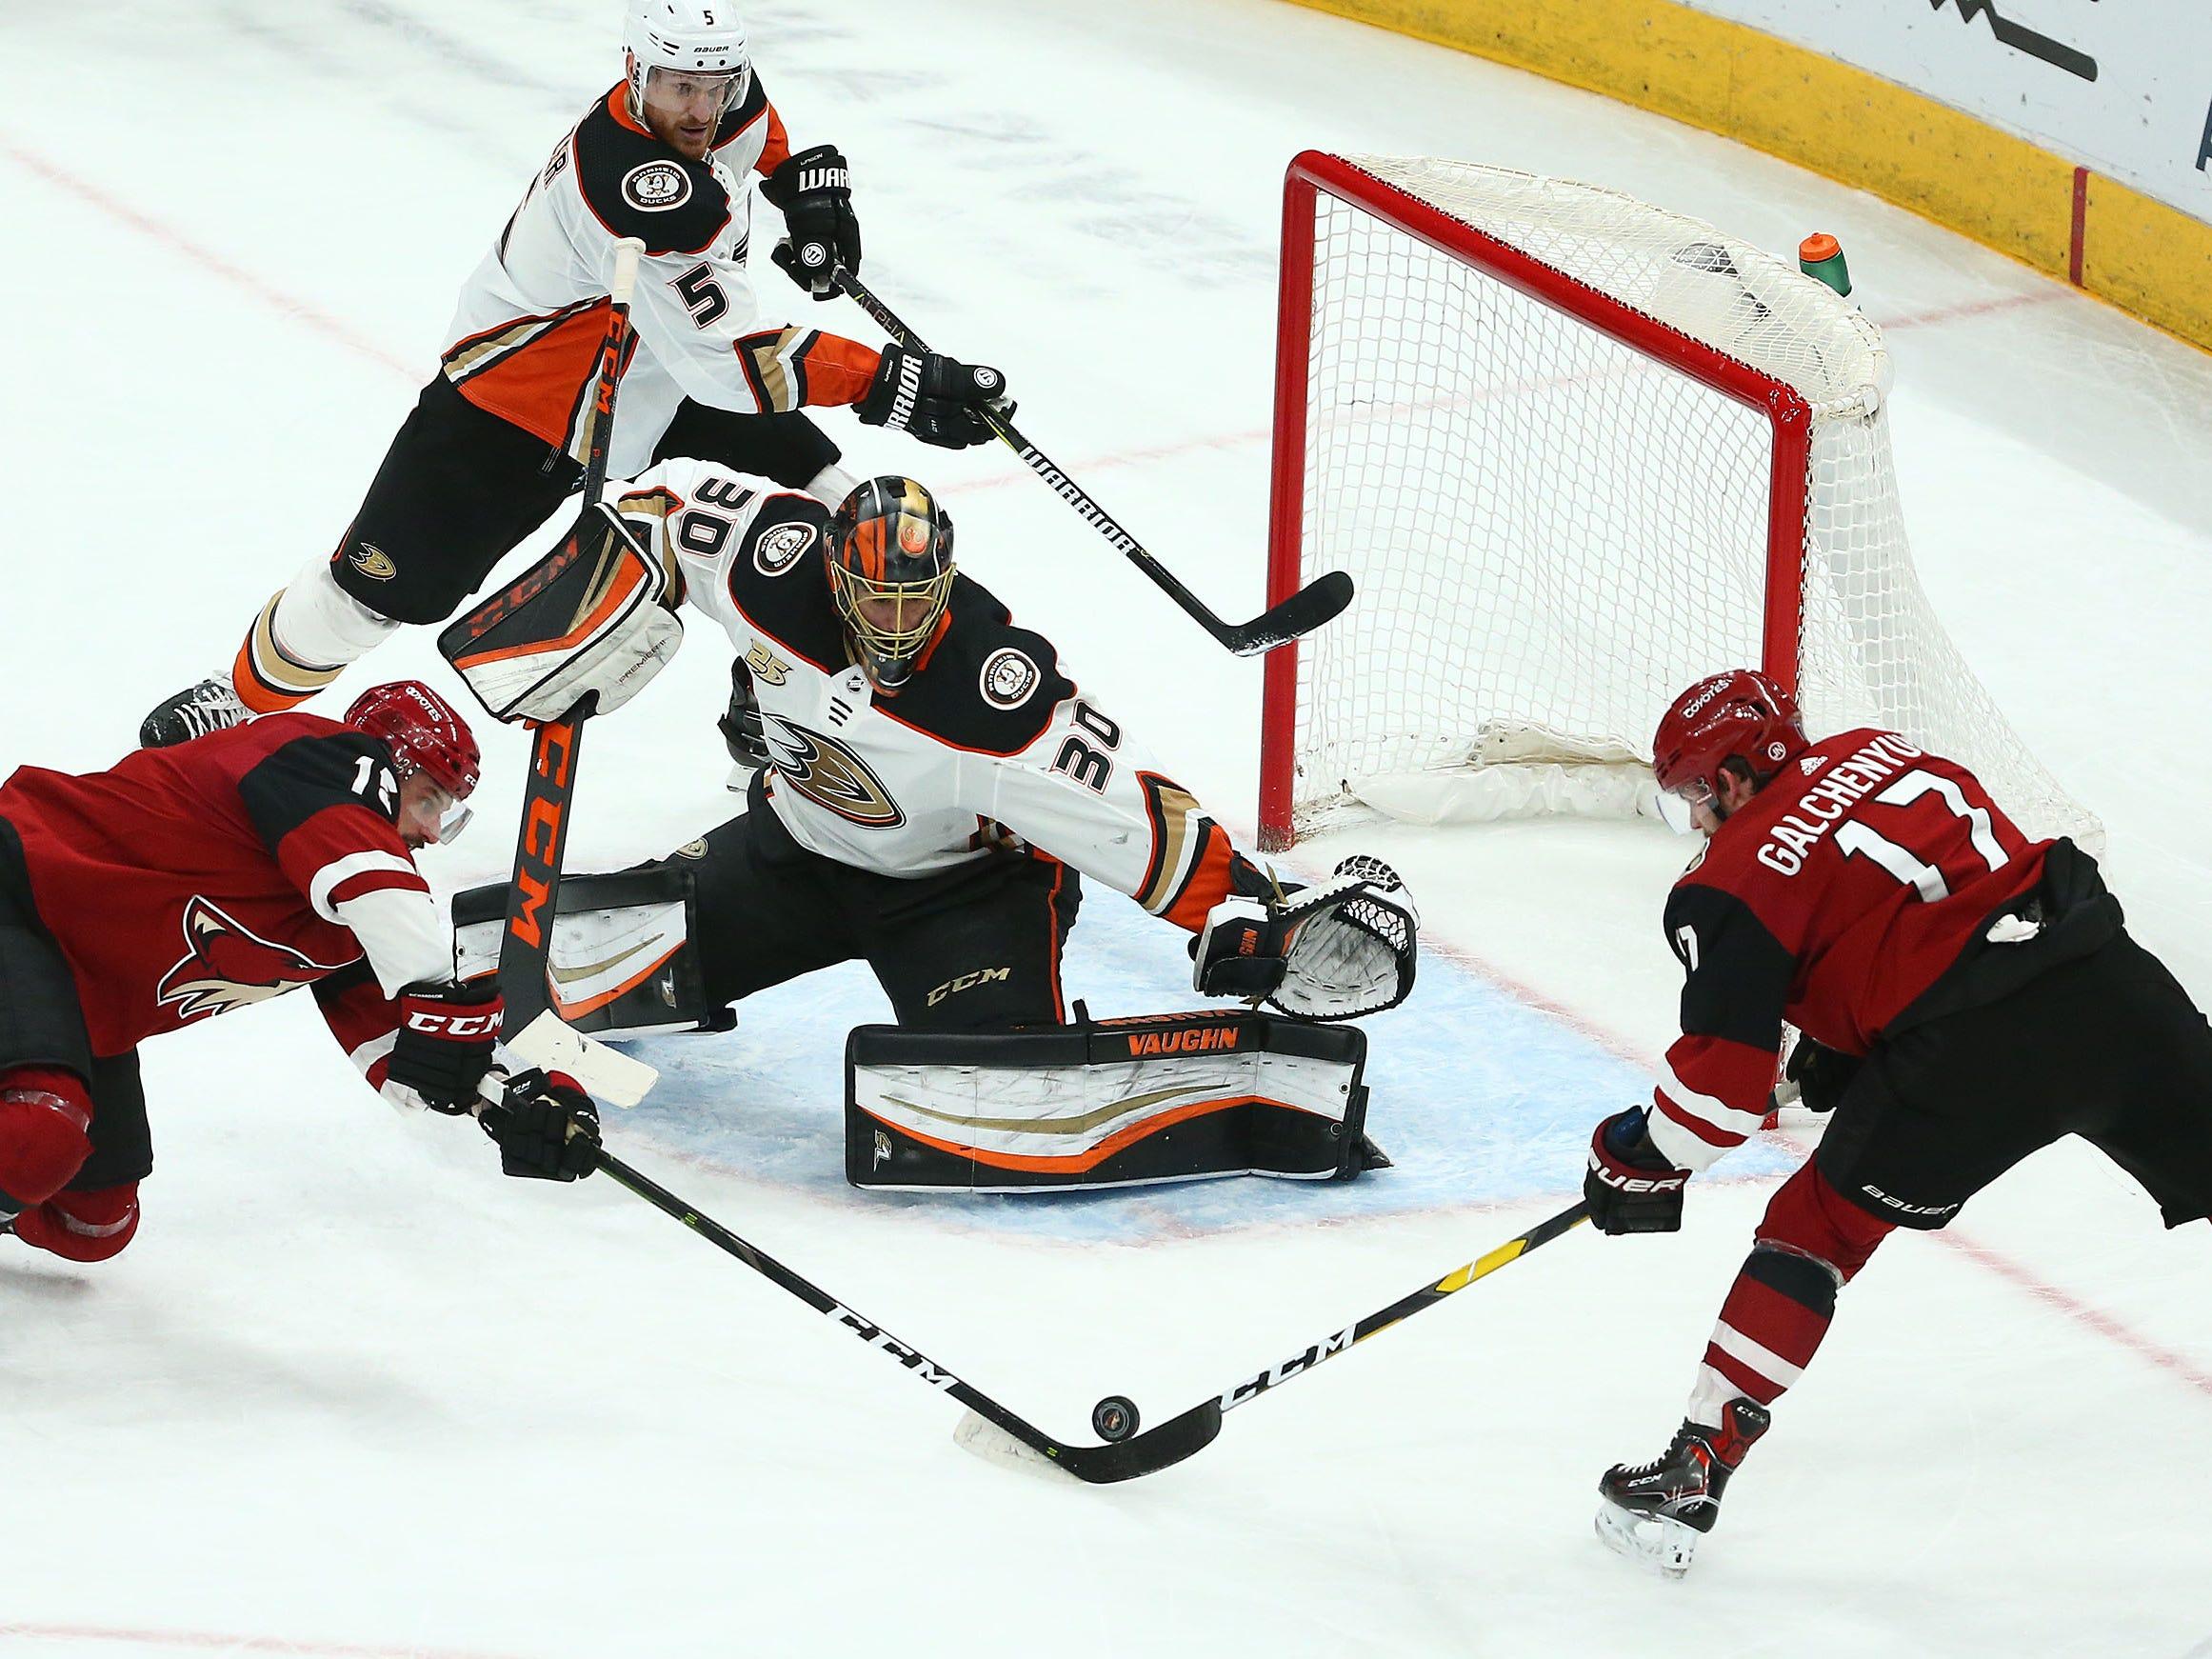 Arizona Coyotes center Alex Galchenyuk (17) shots and misses against Anaheim Ducks goaltender Ryan Miller (30) in the first period on Mar. 5, 2019, at Gila River Arena in Glendale, Ariz.